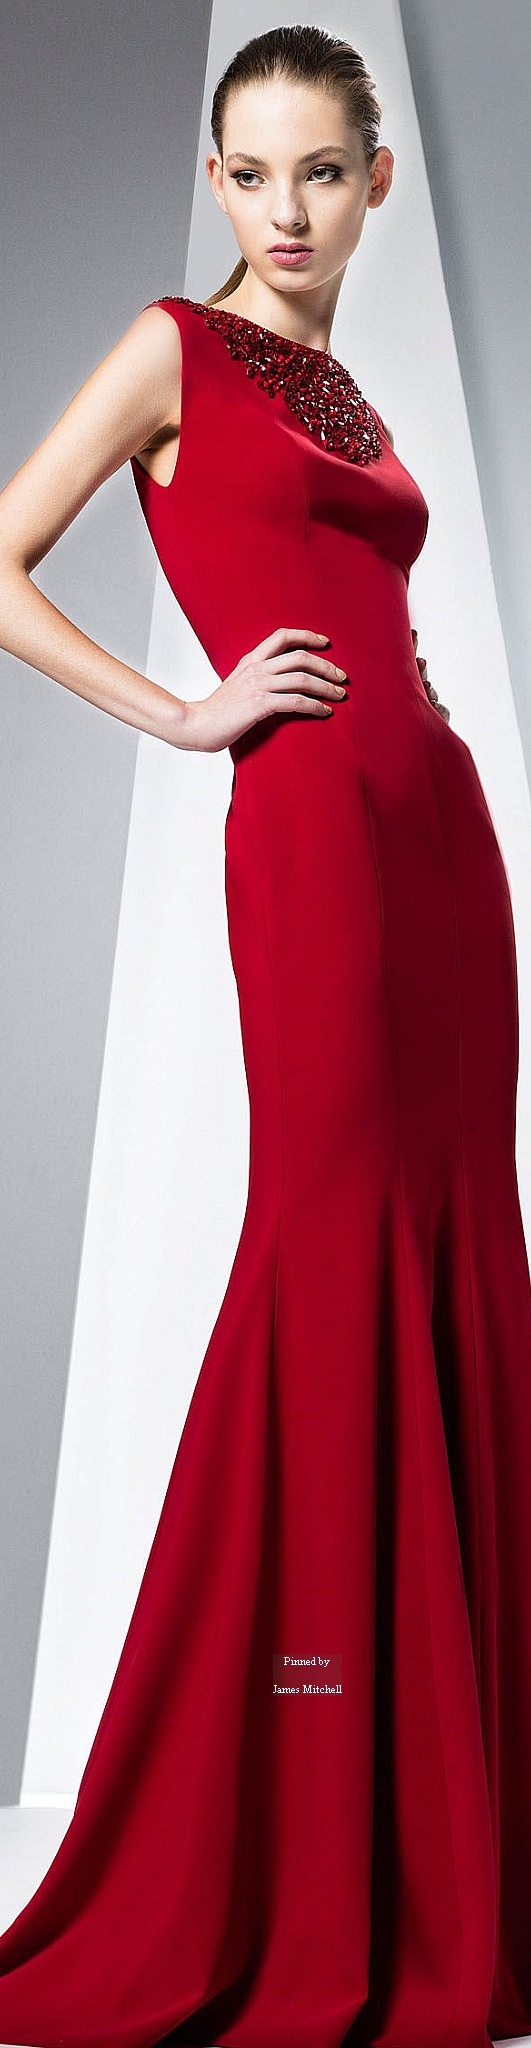 Georges Hobeika Ready-to-Wear Fall-winter 2015-2016 #Fashion #WomensFashion #HauteCouture #Style #DesignerDresses #Silk #Lace bitinformed.com